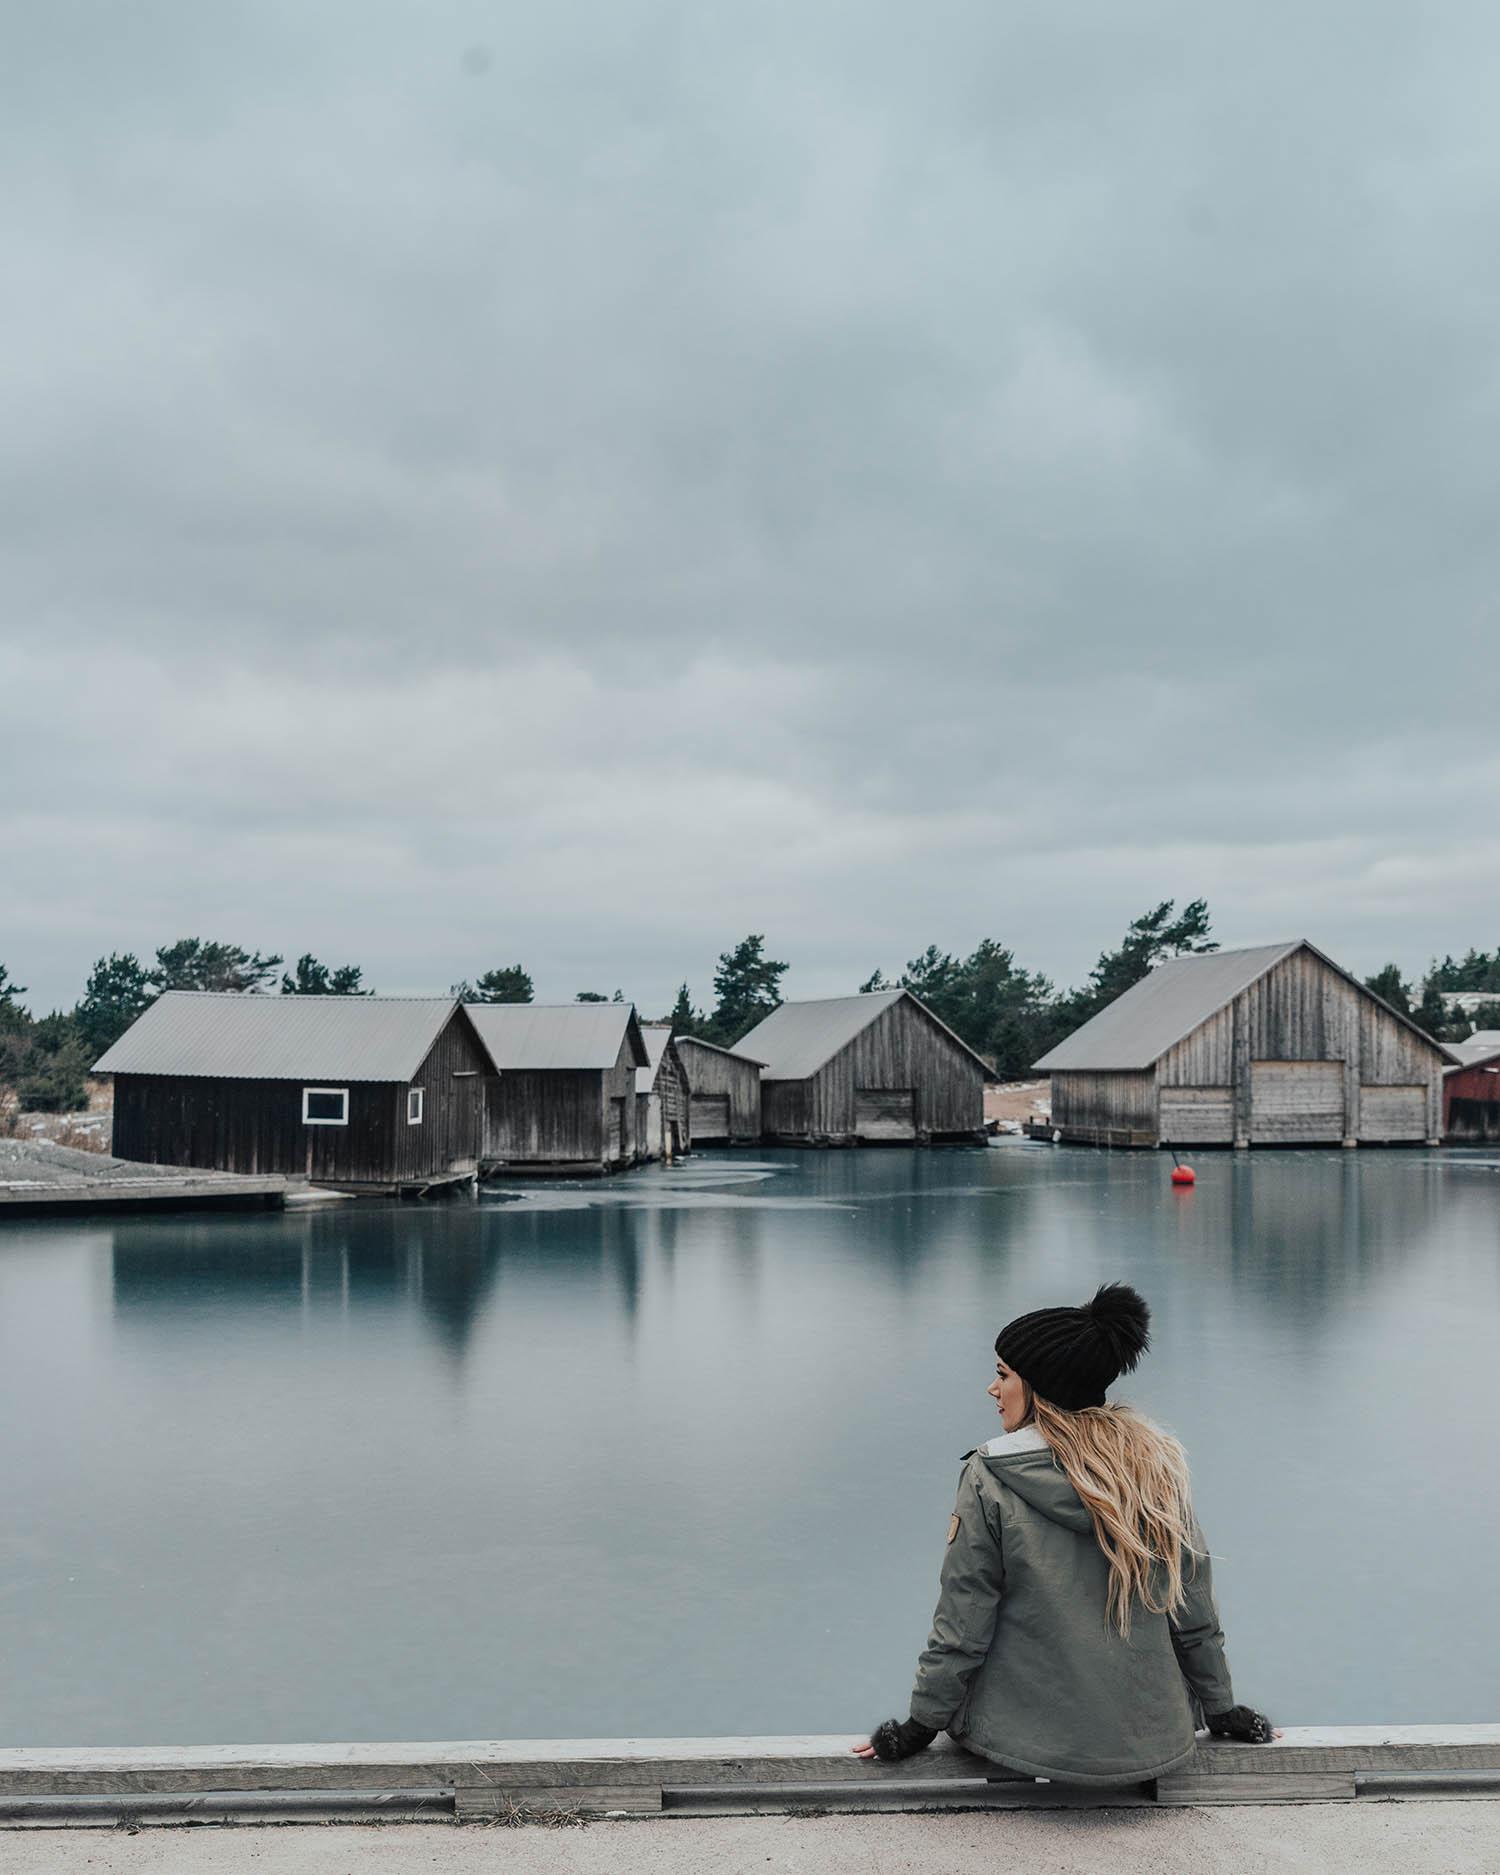 Adaras i Käringsund, Åland, Vinter